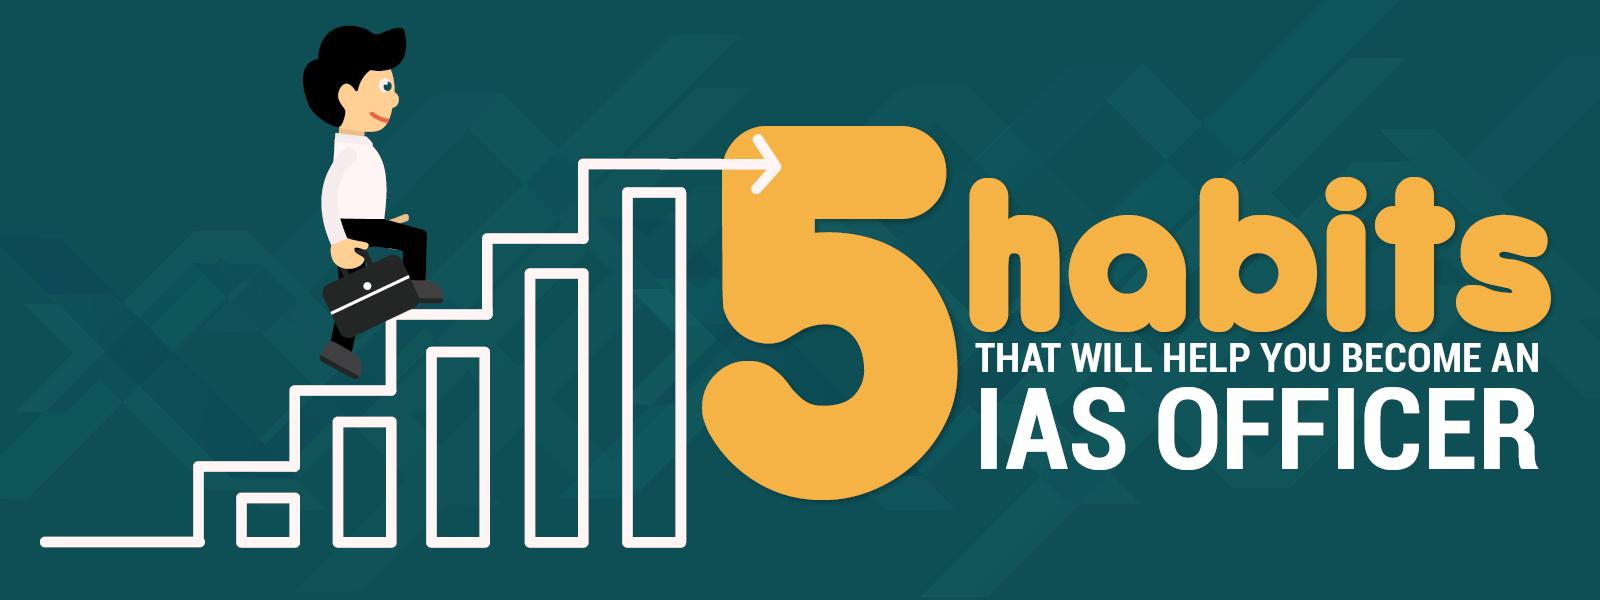 5 habits to follow